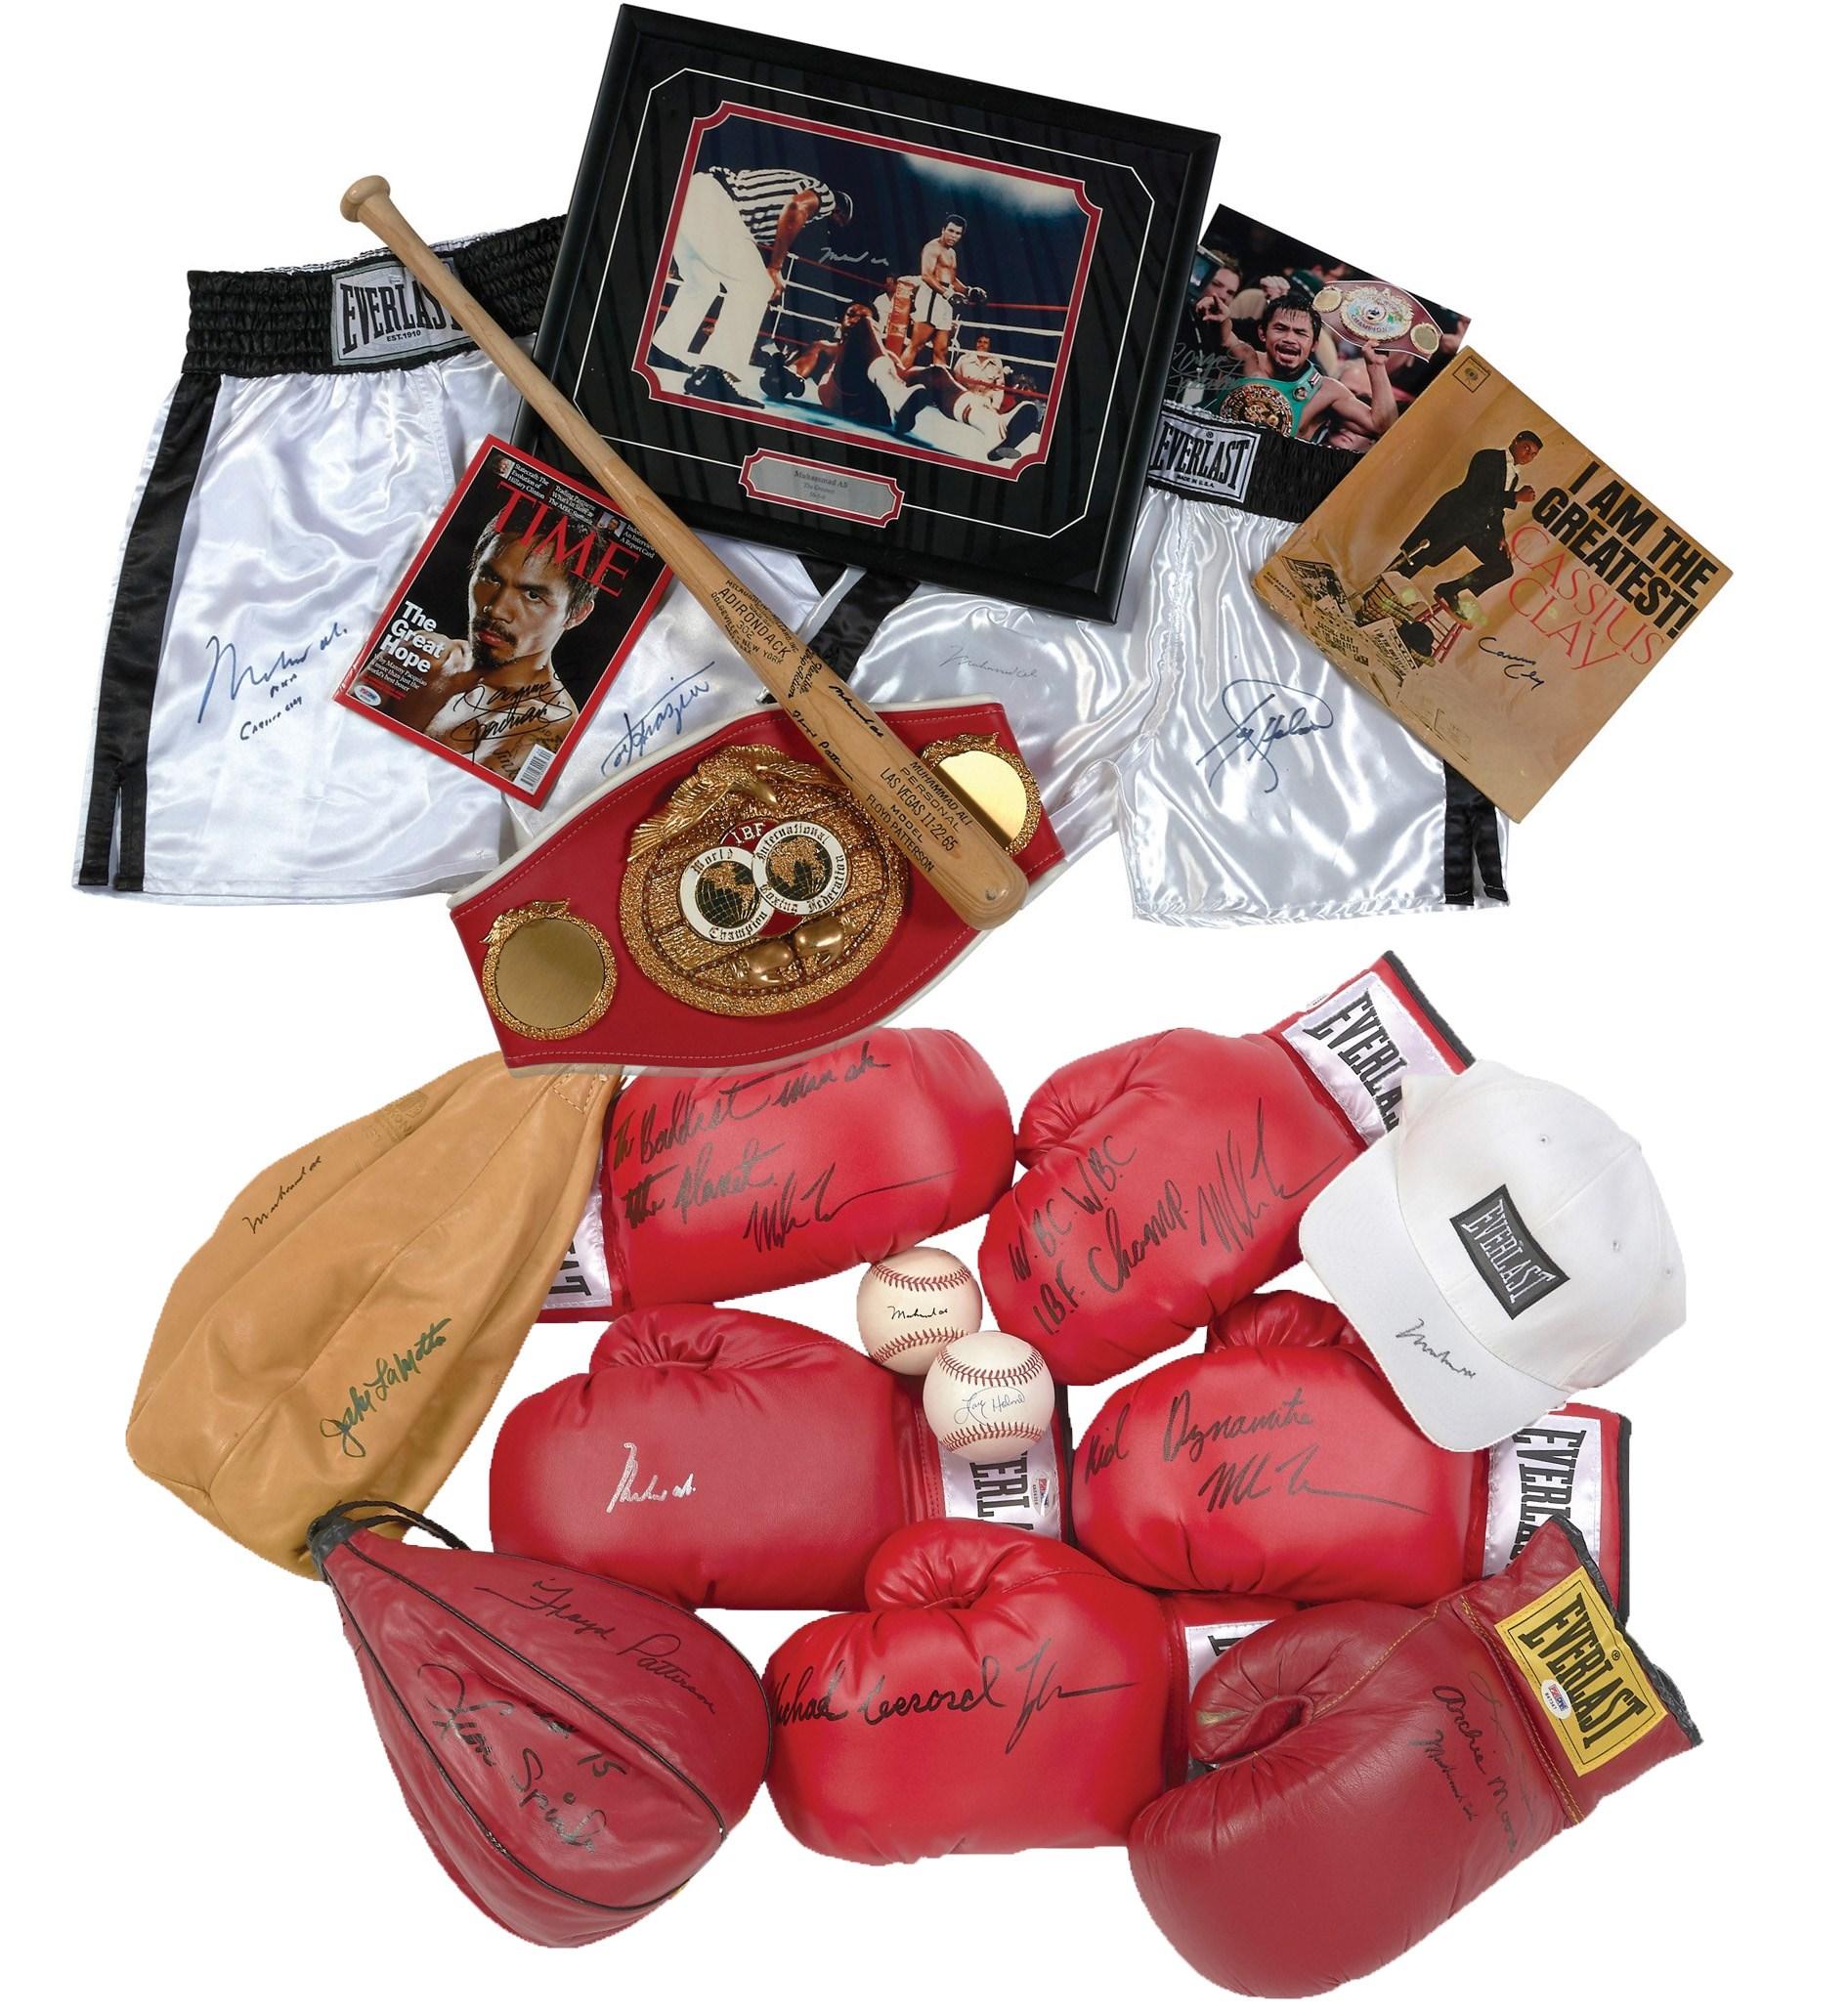 Muhammad Ali & Boxing - Leland's Classic